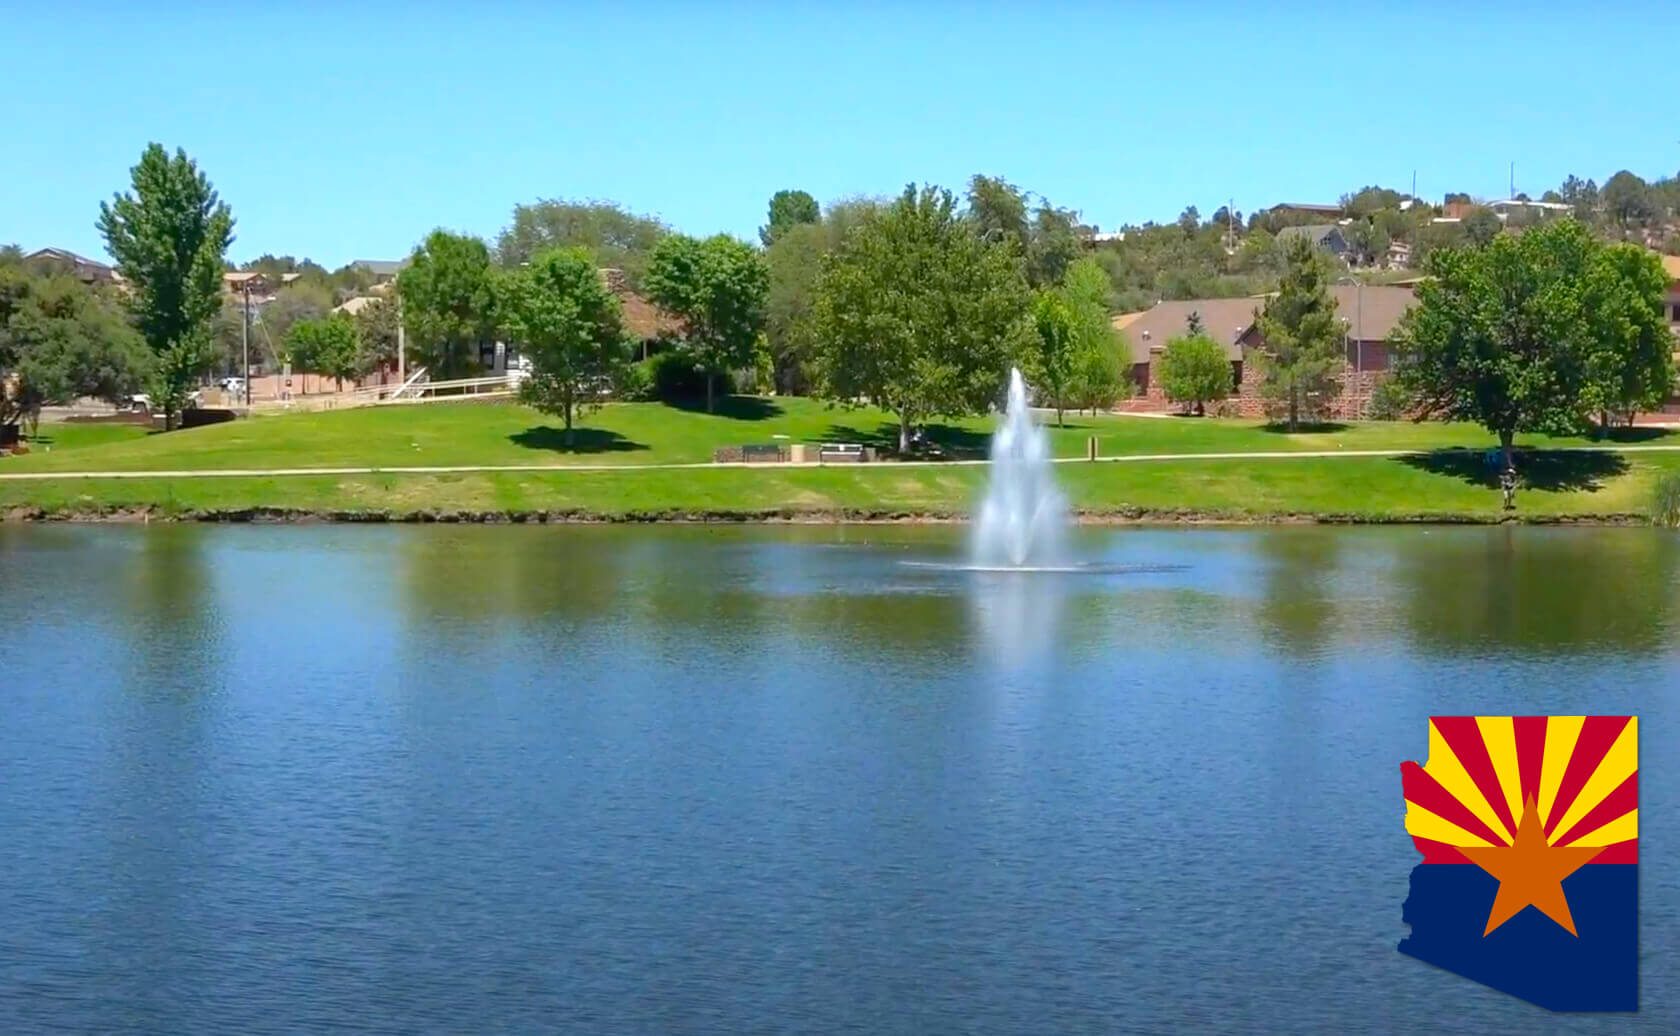 Arizona-Community-Fishing-Lakes-Ponds-Reports Copy